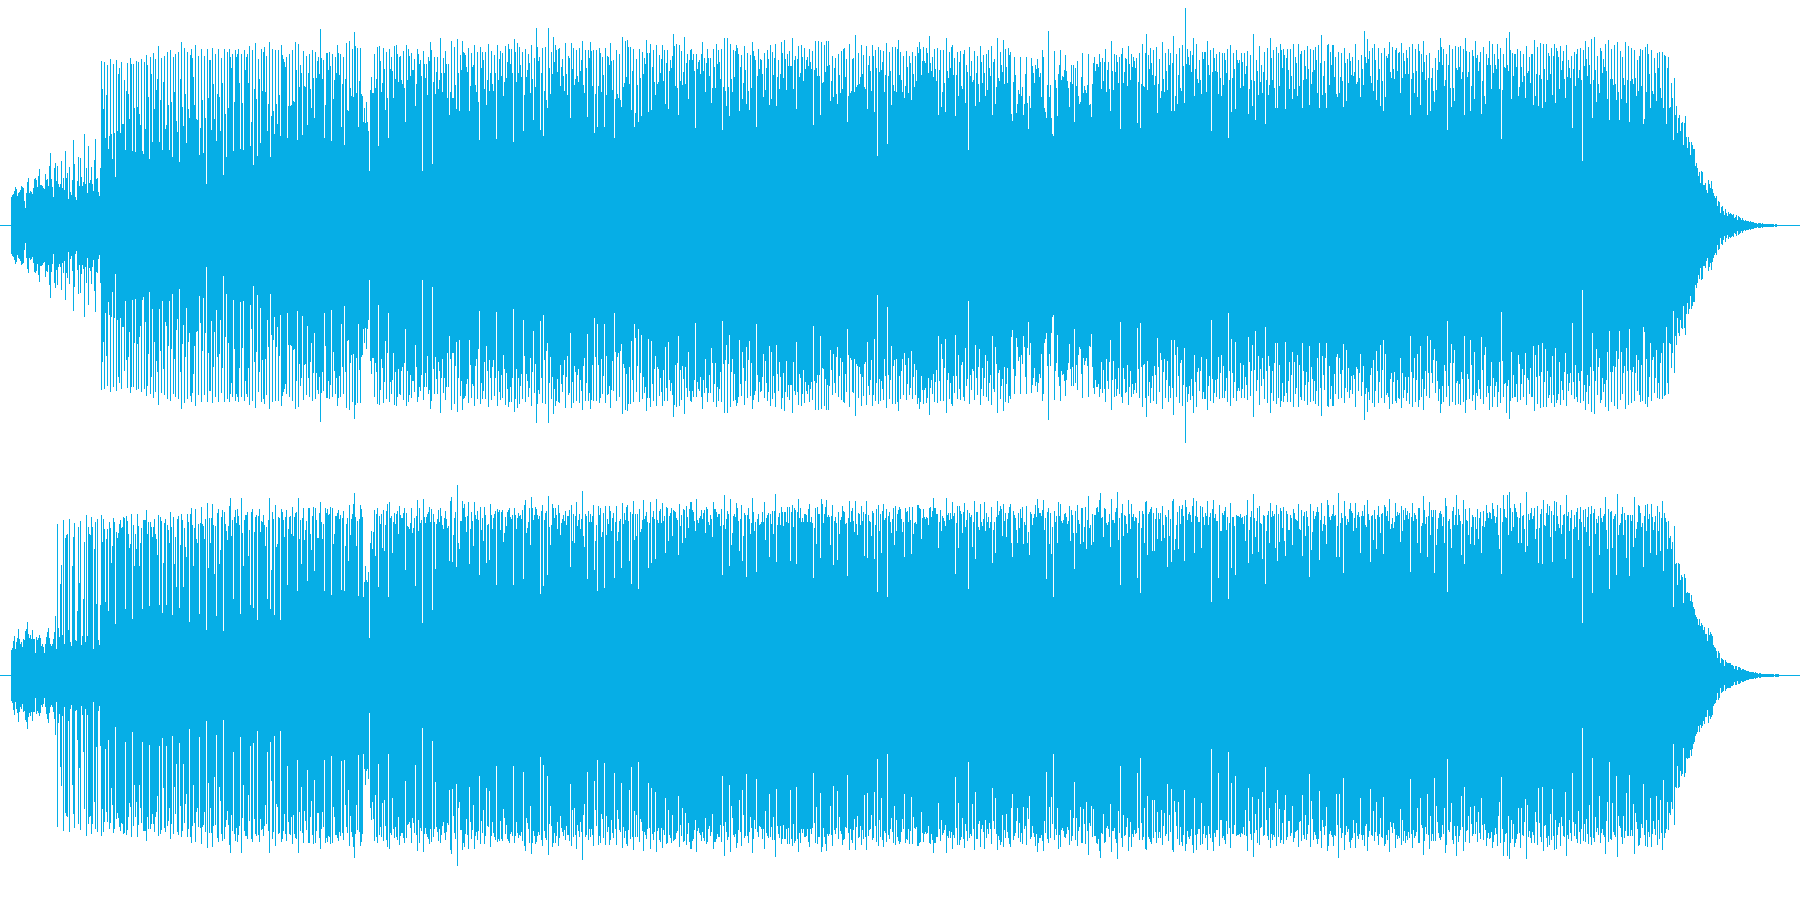 Piano Deep Houseの再生済みの波形